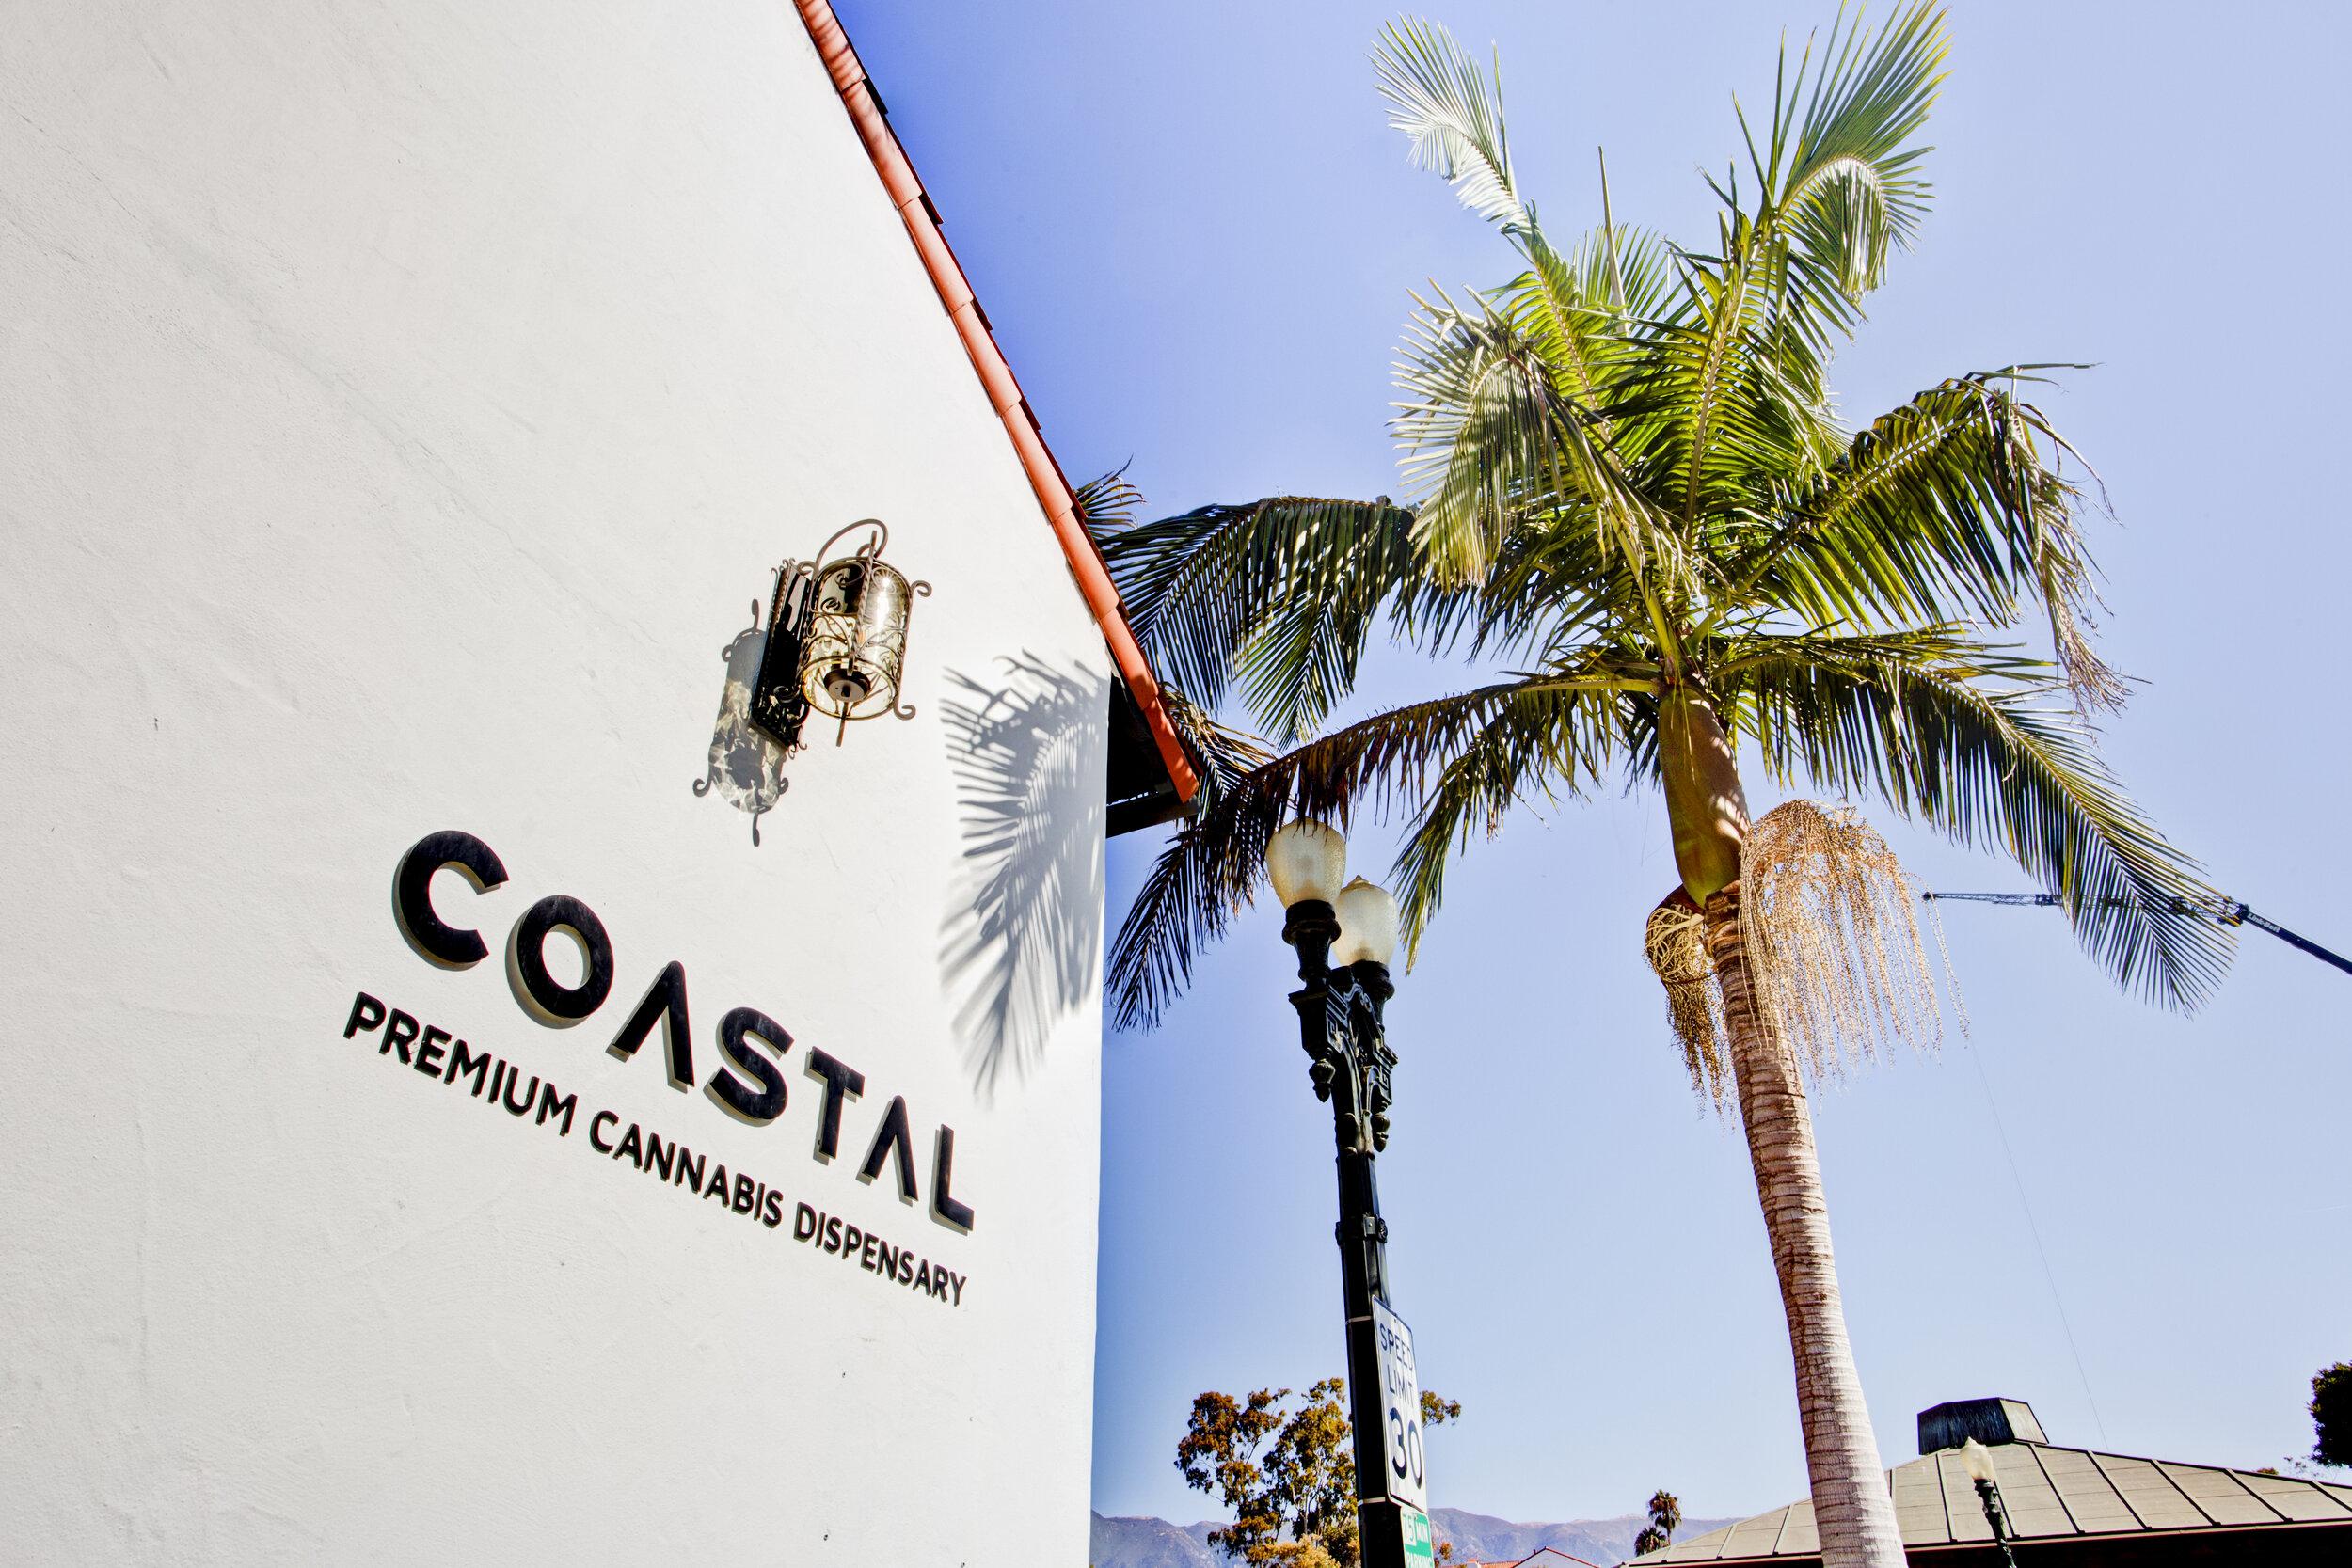 COASTAL_29.jpg